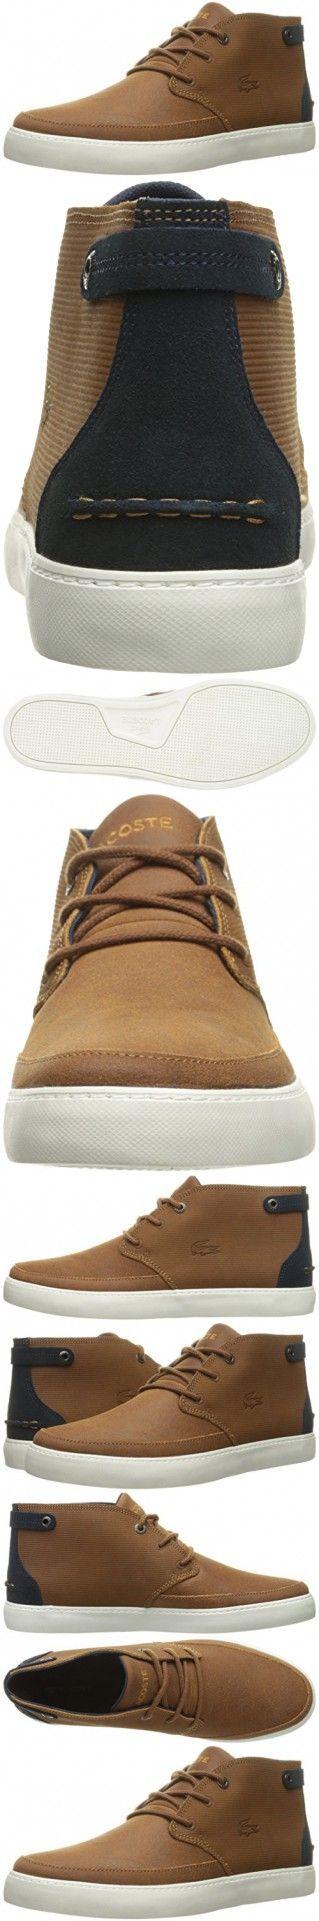 Lacoste Men's Clavel M 316 1 Cam Boot, Tan, 9.5 M US